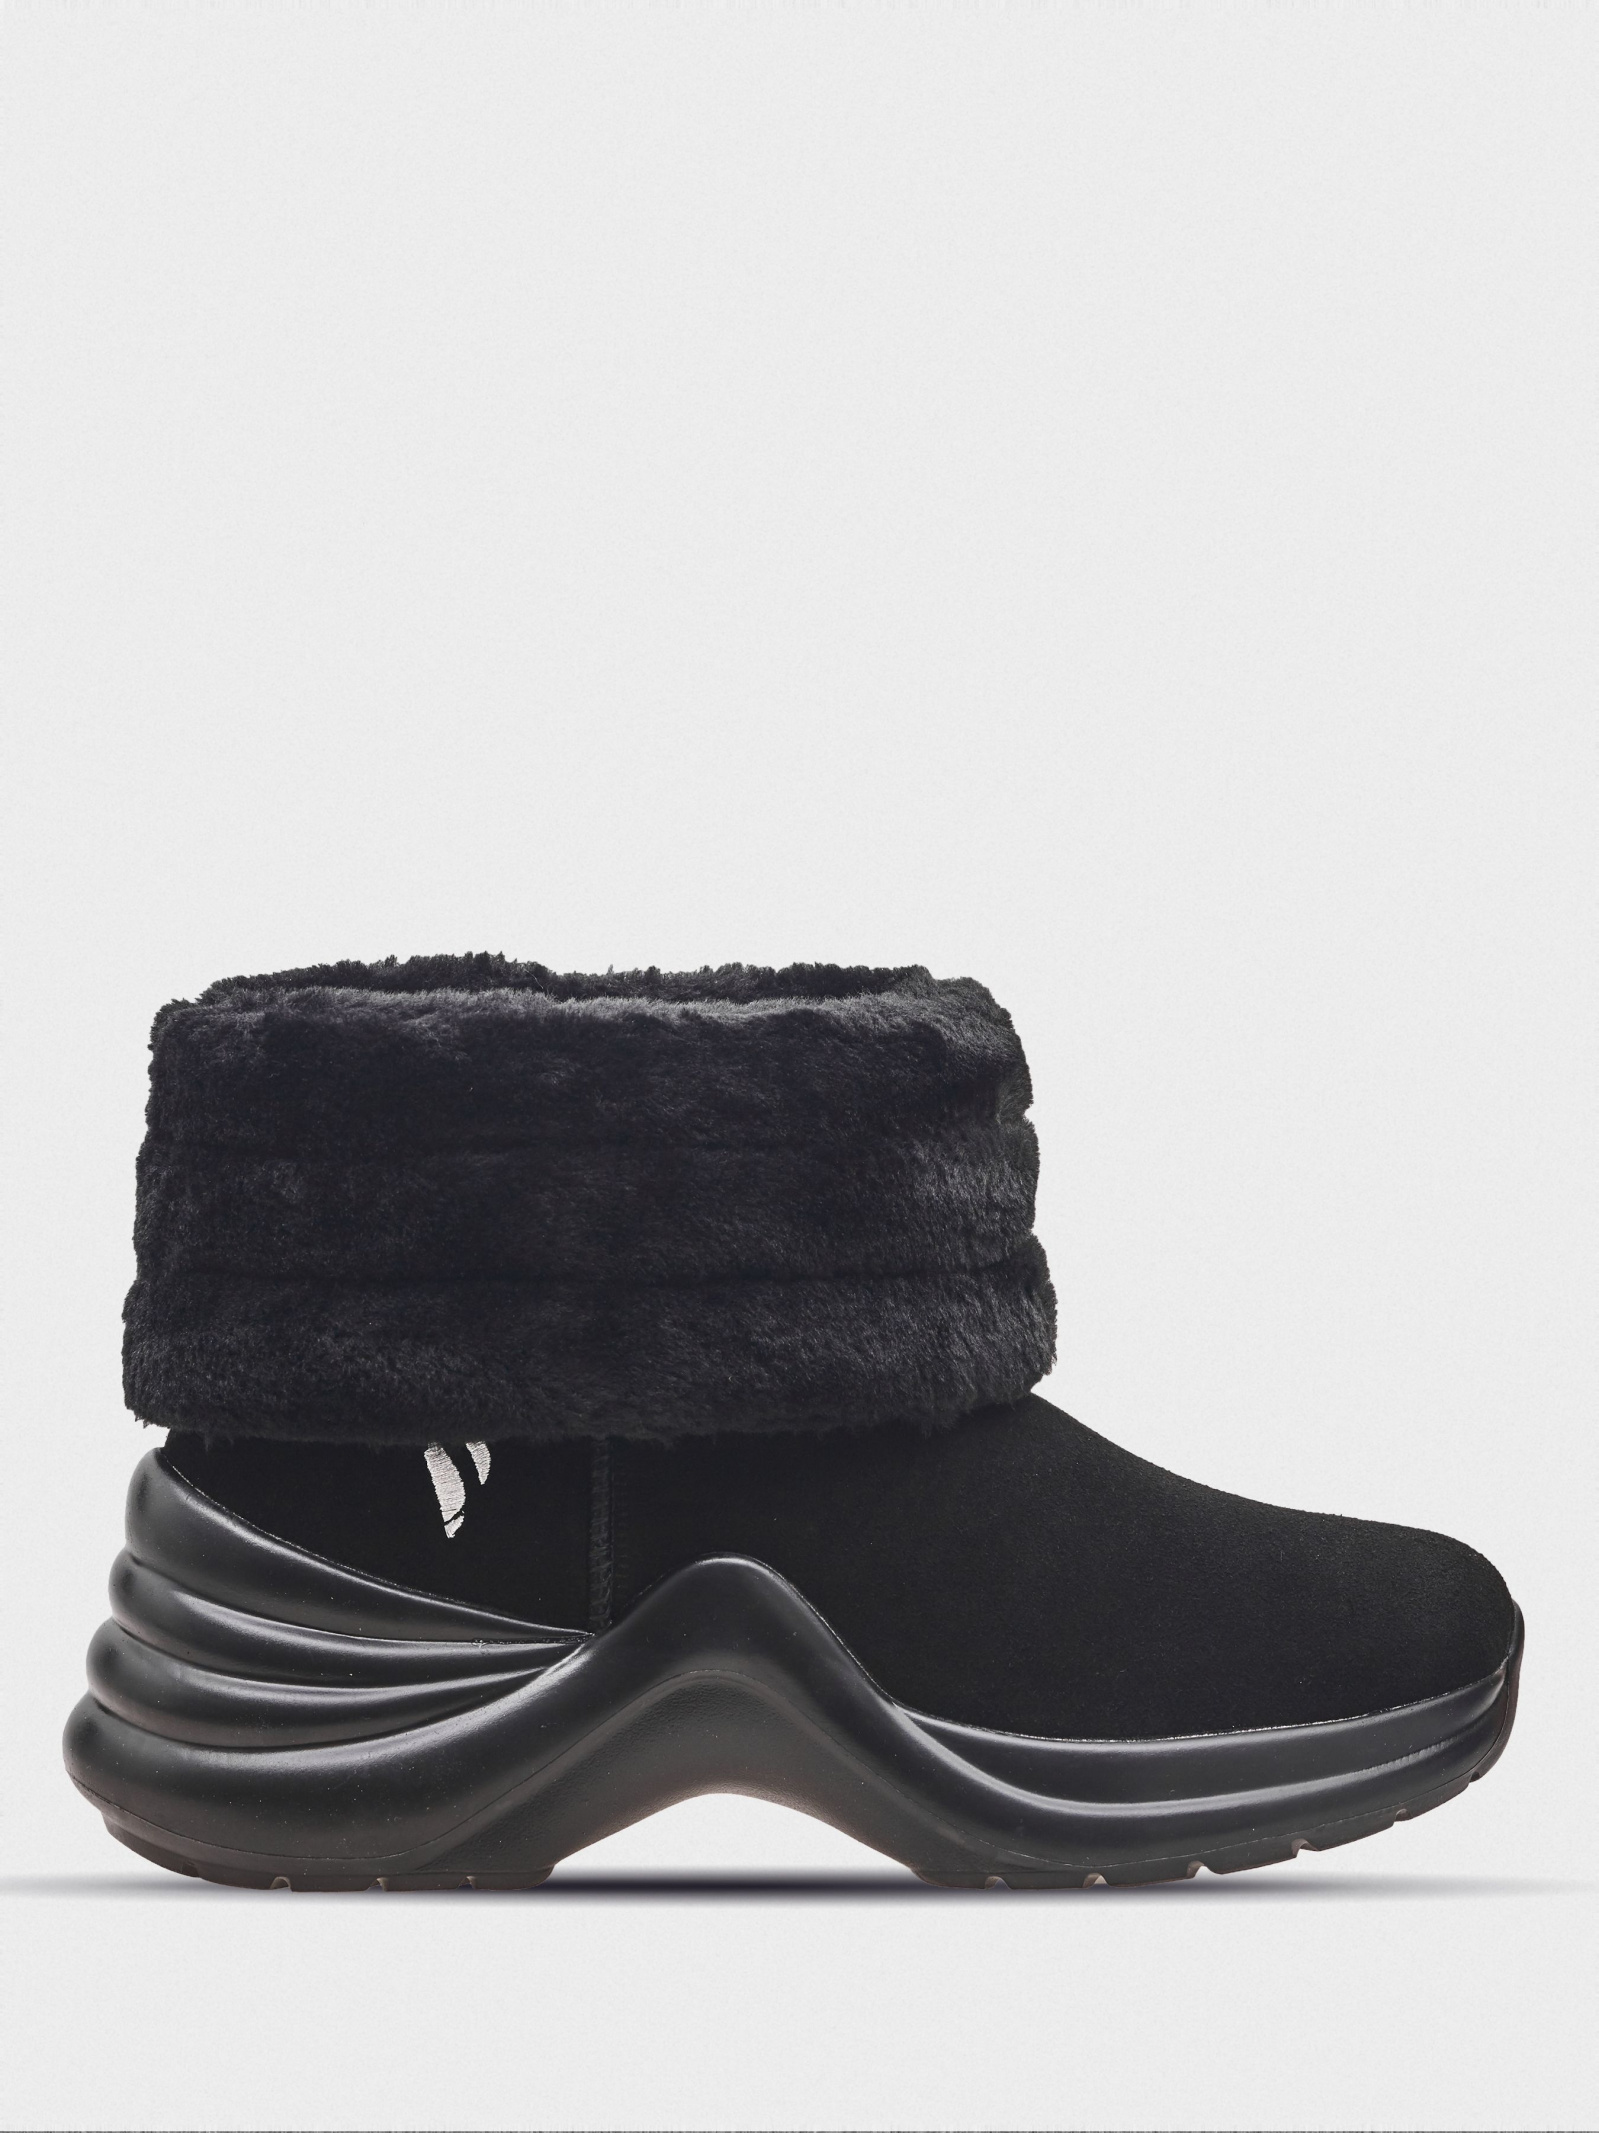 Ботинки женские Skechers KW5243 цена, 2017